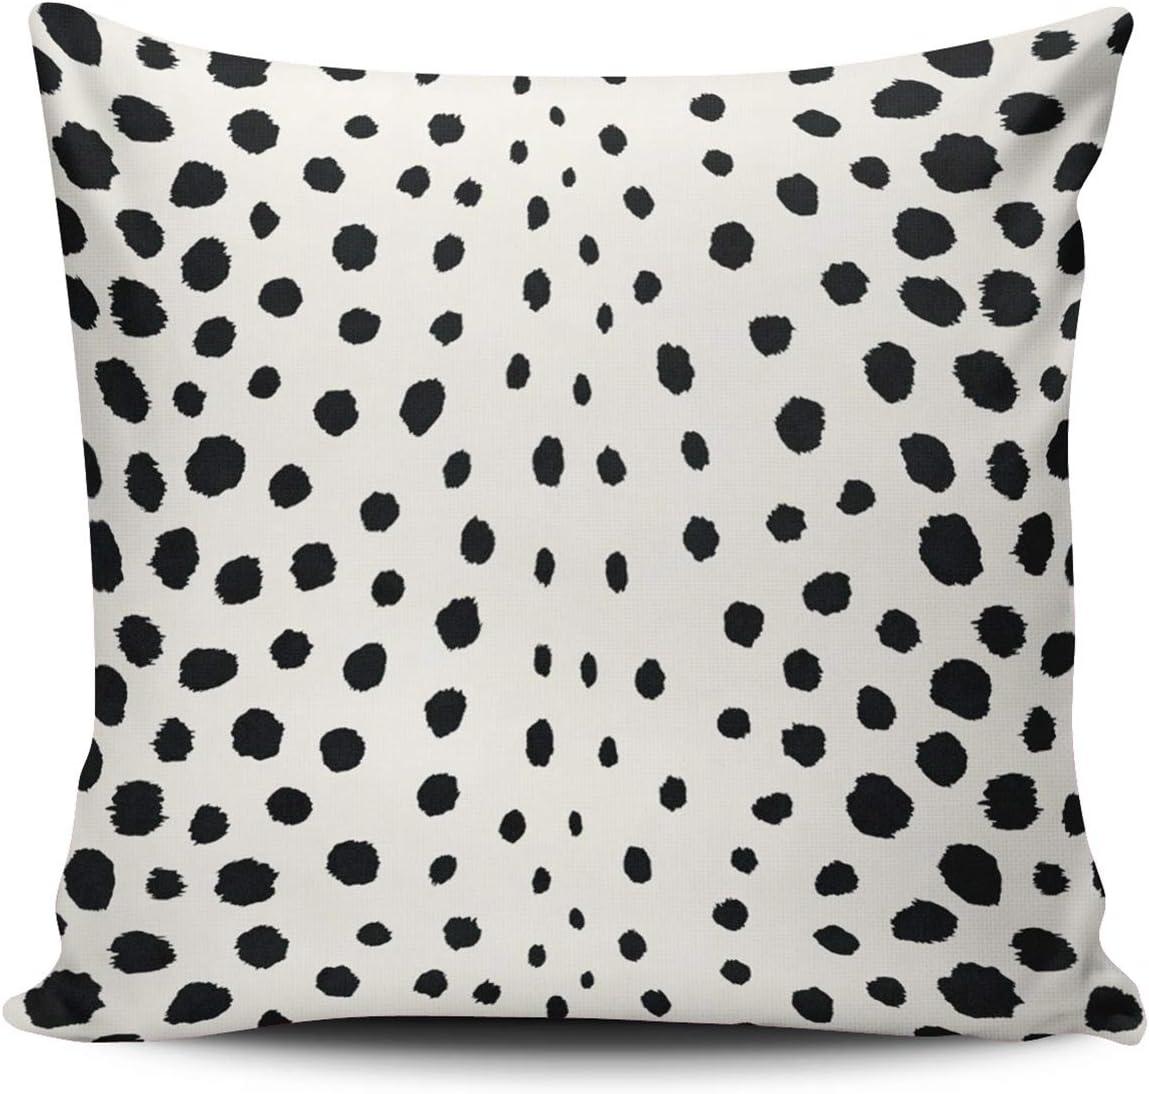 Amazon Com Fanaing Chic Black Cheetah Print Pattern Pillowcase Home Sofa Decorative 20x20 Inch Square Throw Pillow Case Decor Cushion Covers One Side Printed Home Kitchen